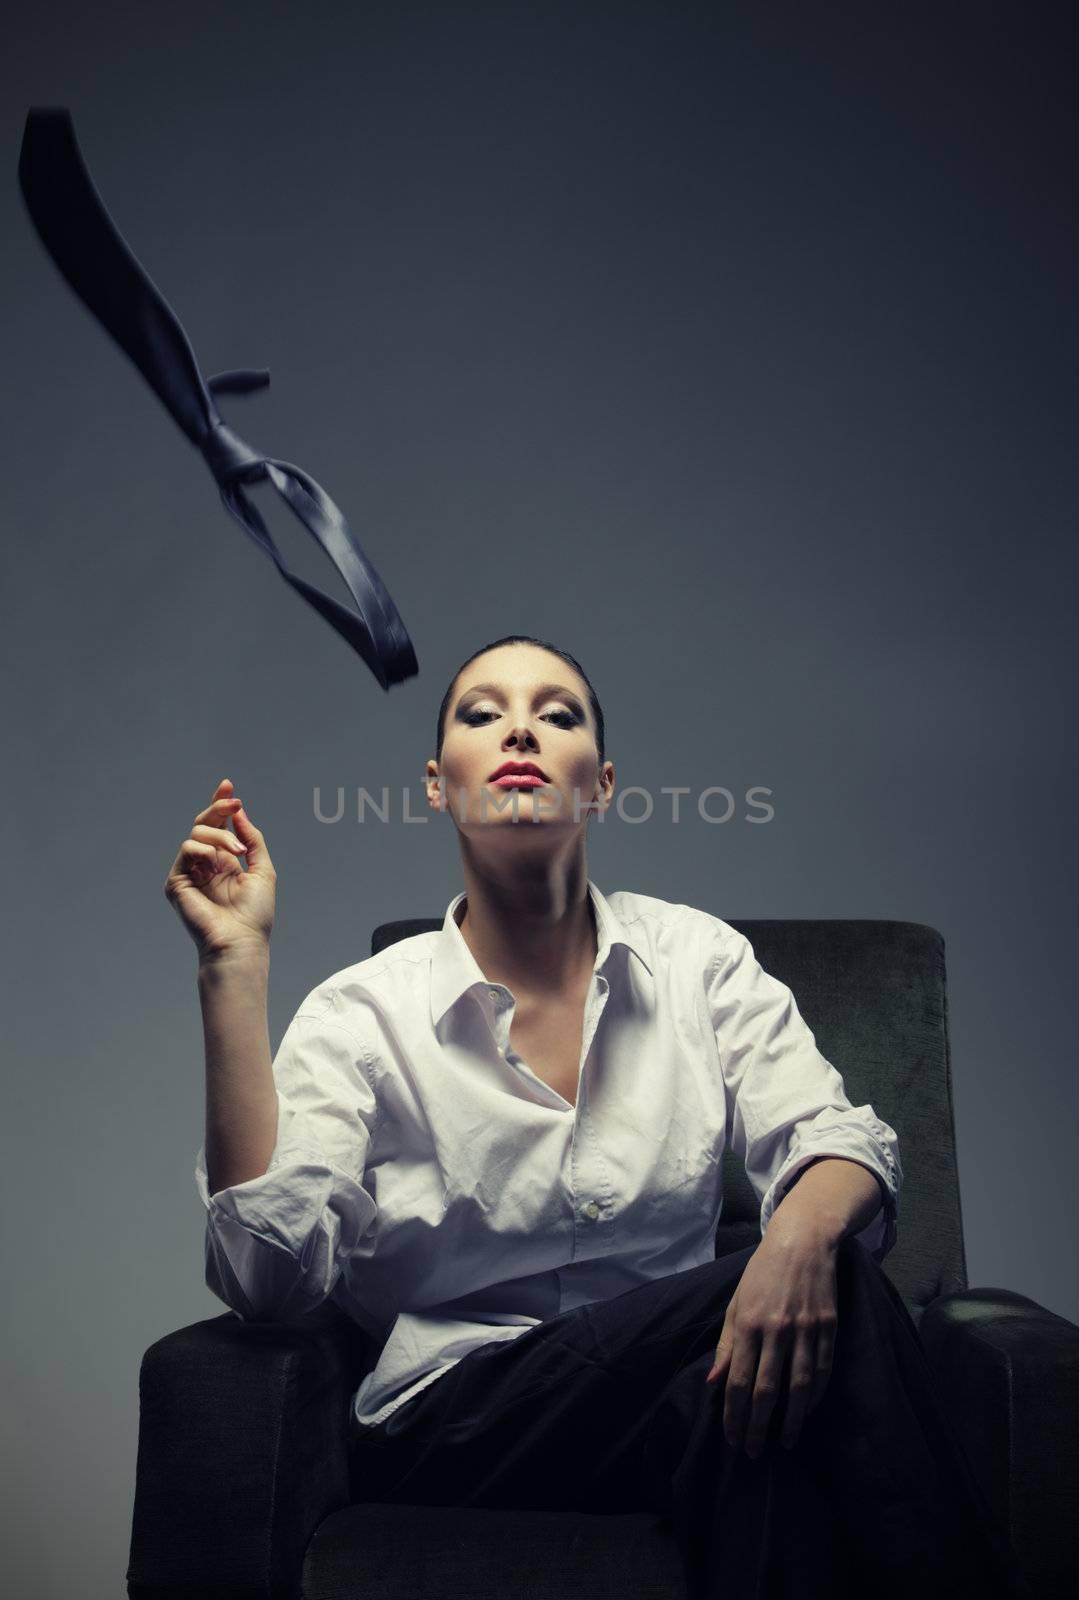 Sensual woman throws the tie, fashion photo